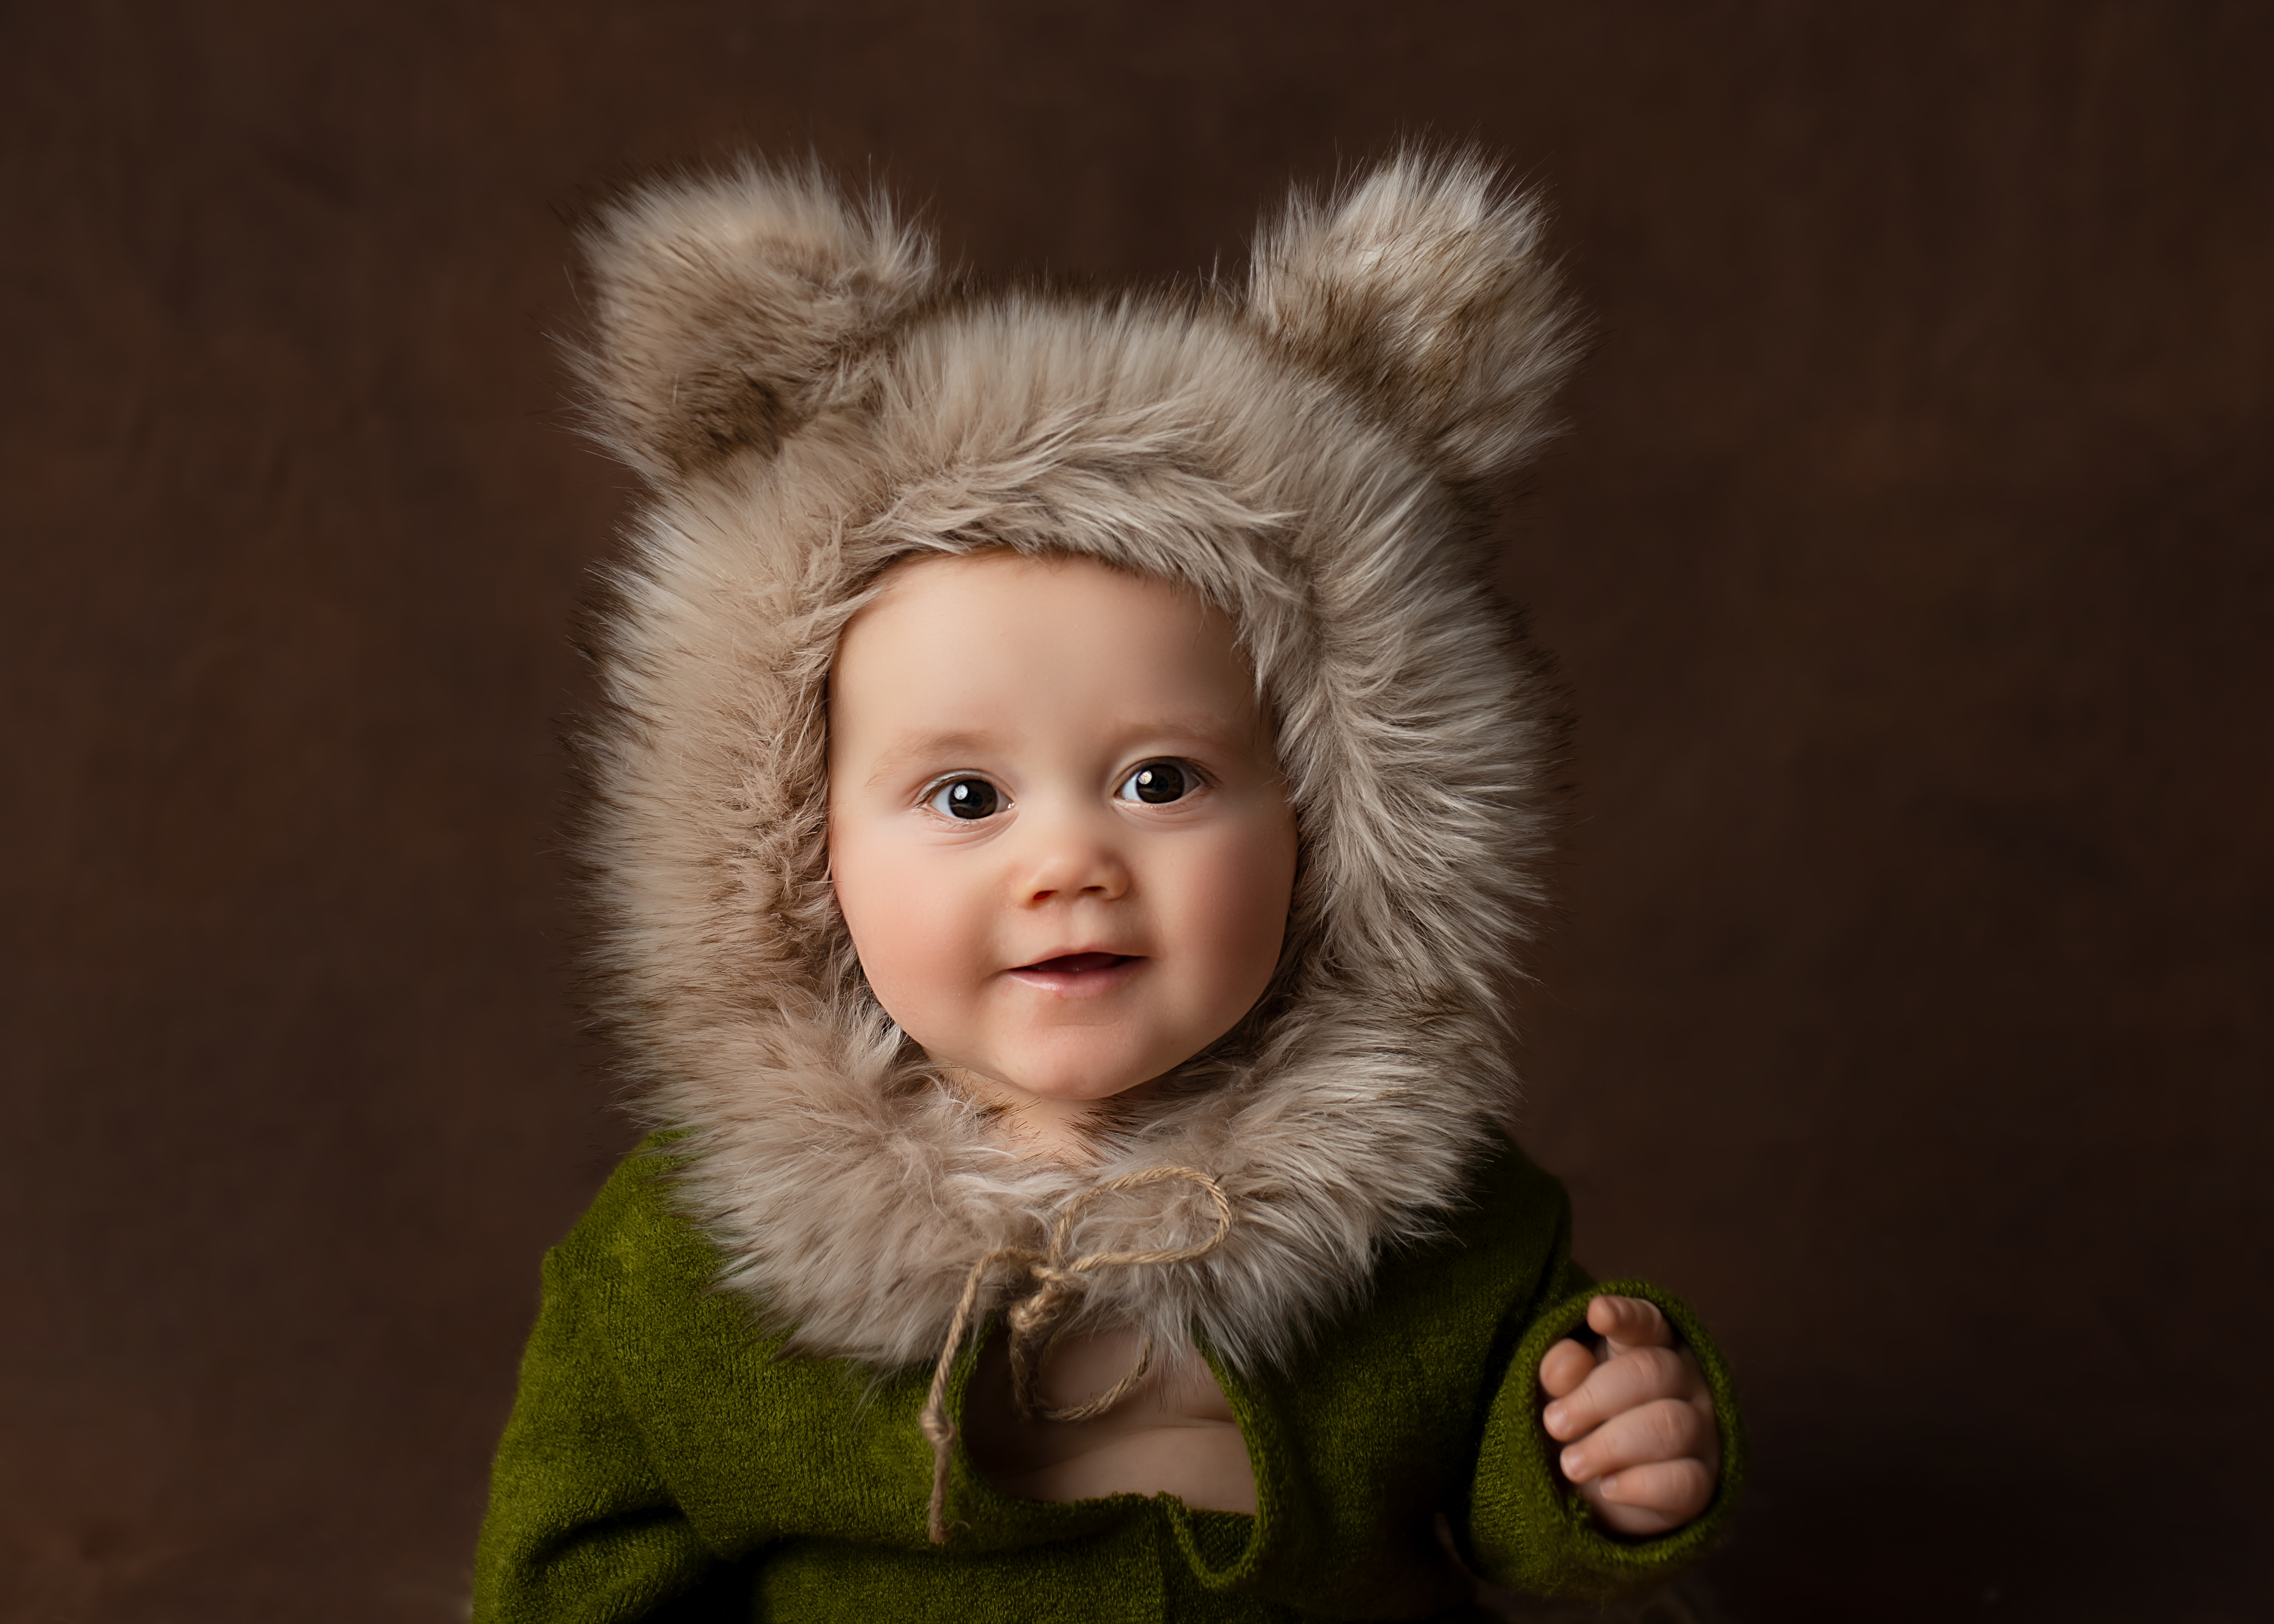 happy baby photography essex